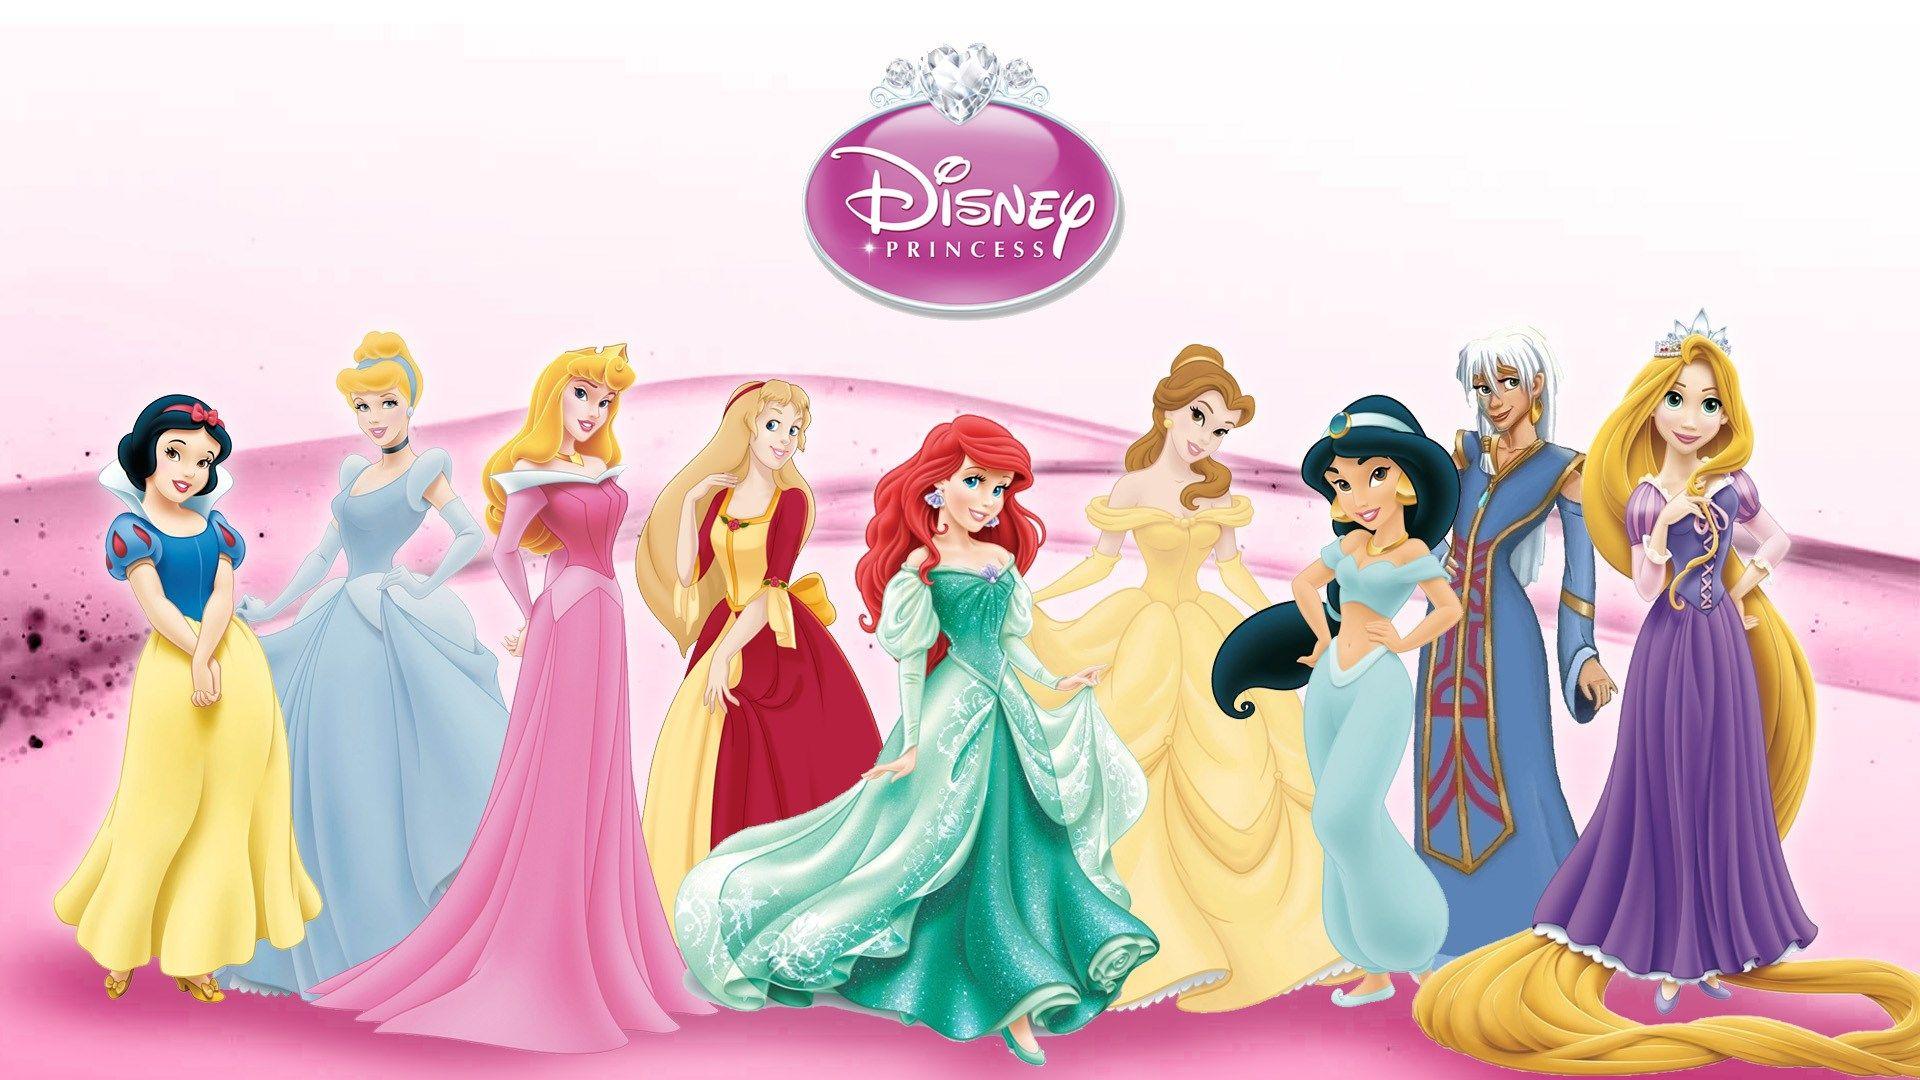 Latest Disney Princess Wallpaper Hd